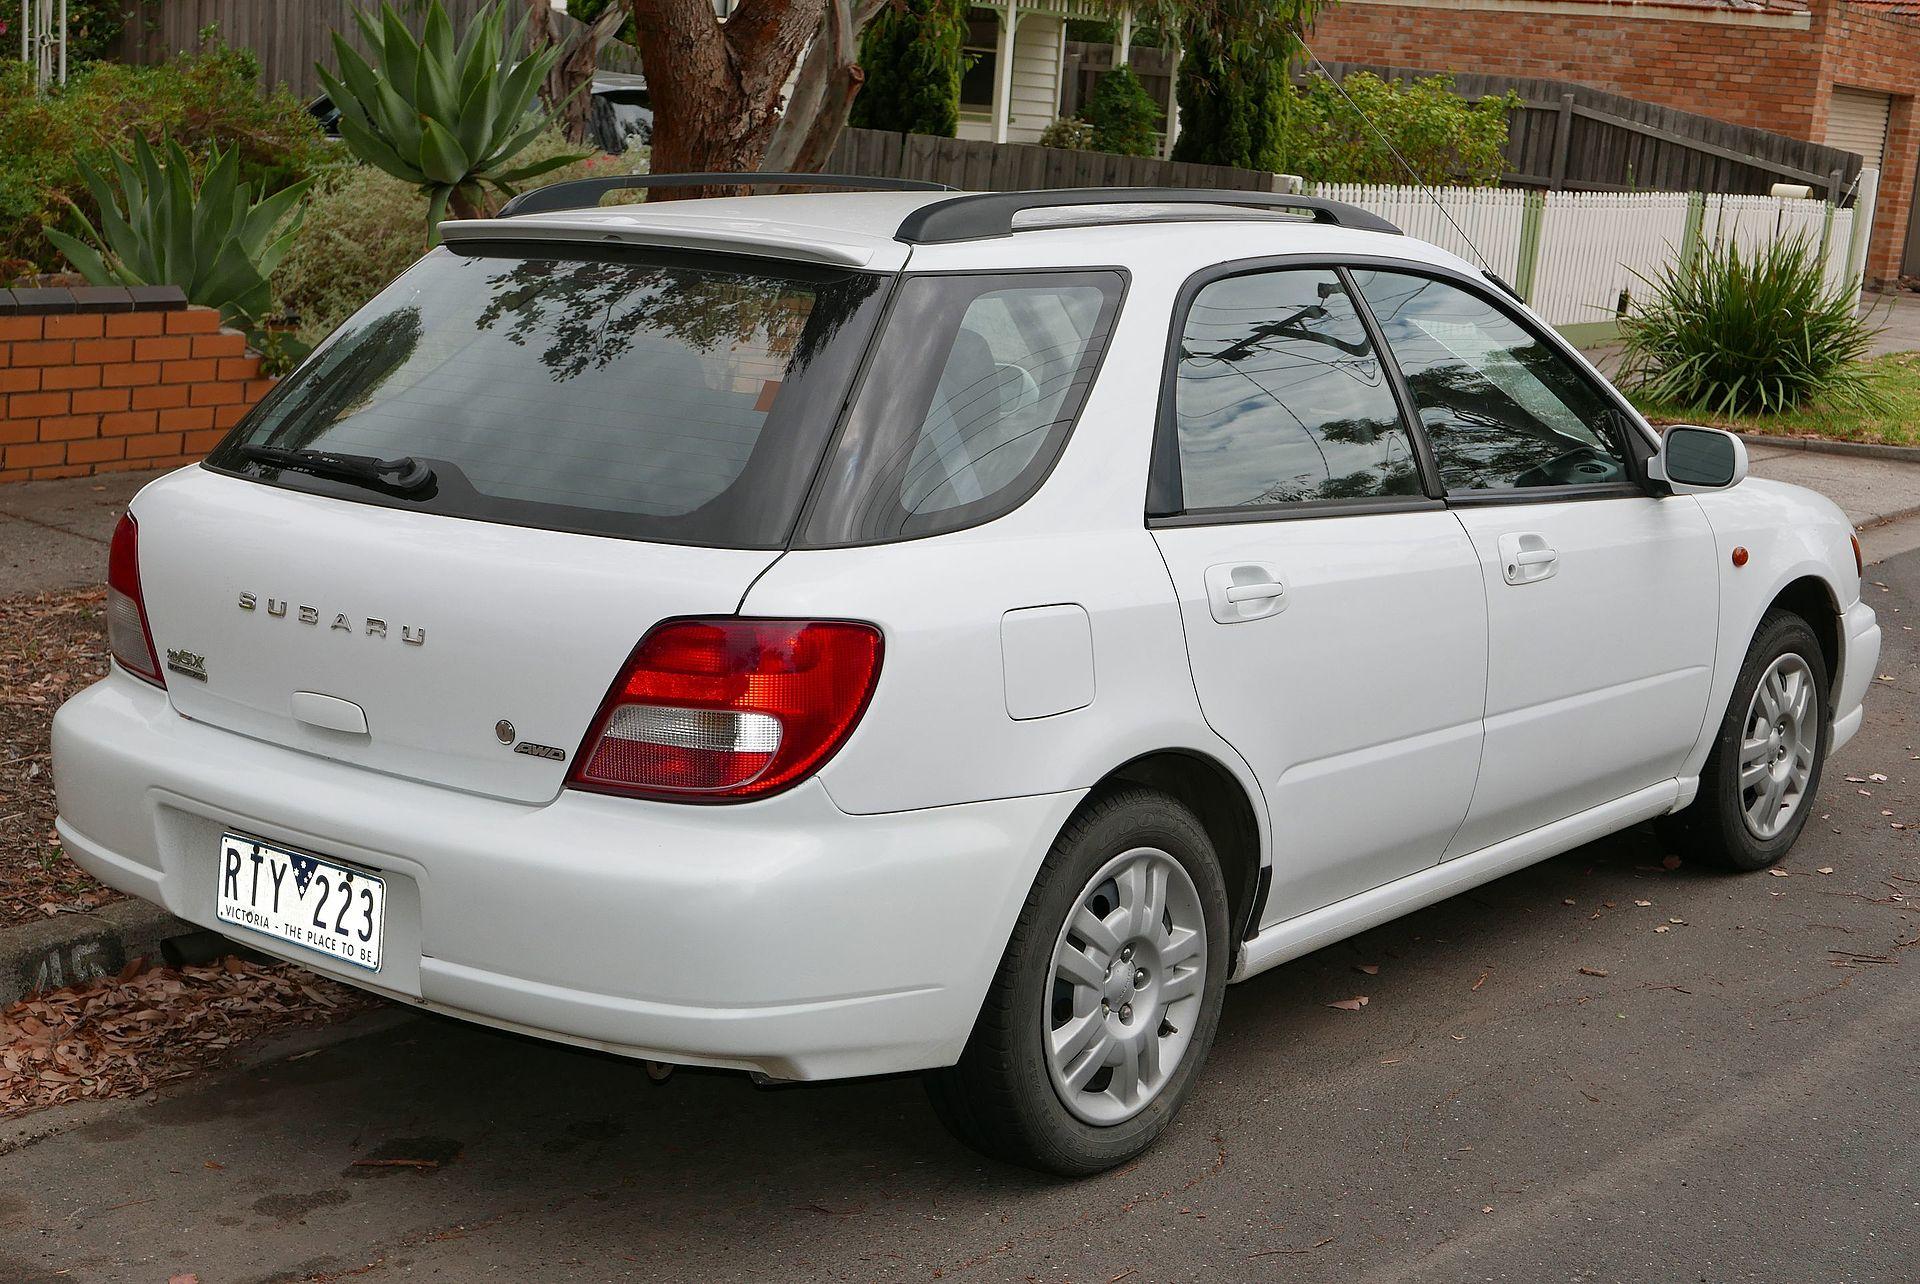 Subaru Impreza Second Generation Wikipedia